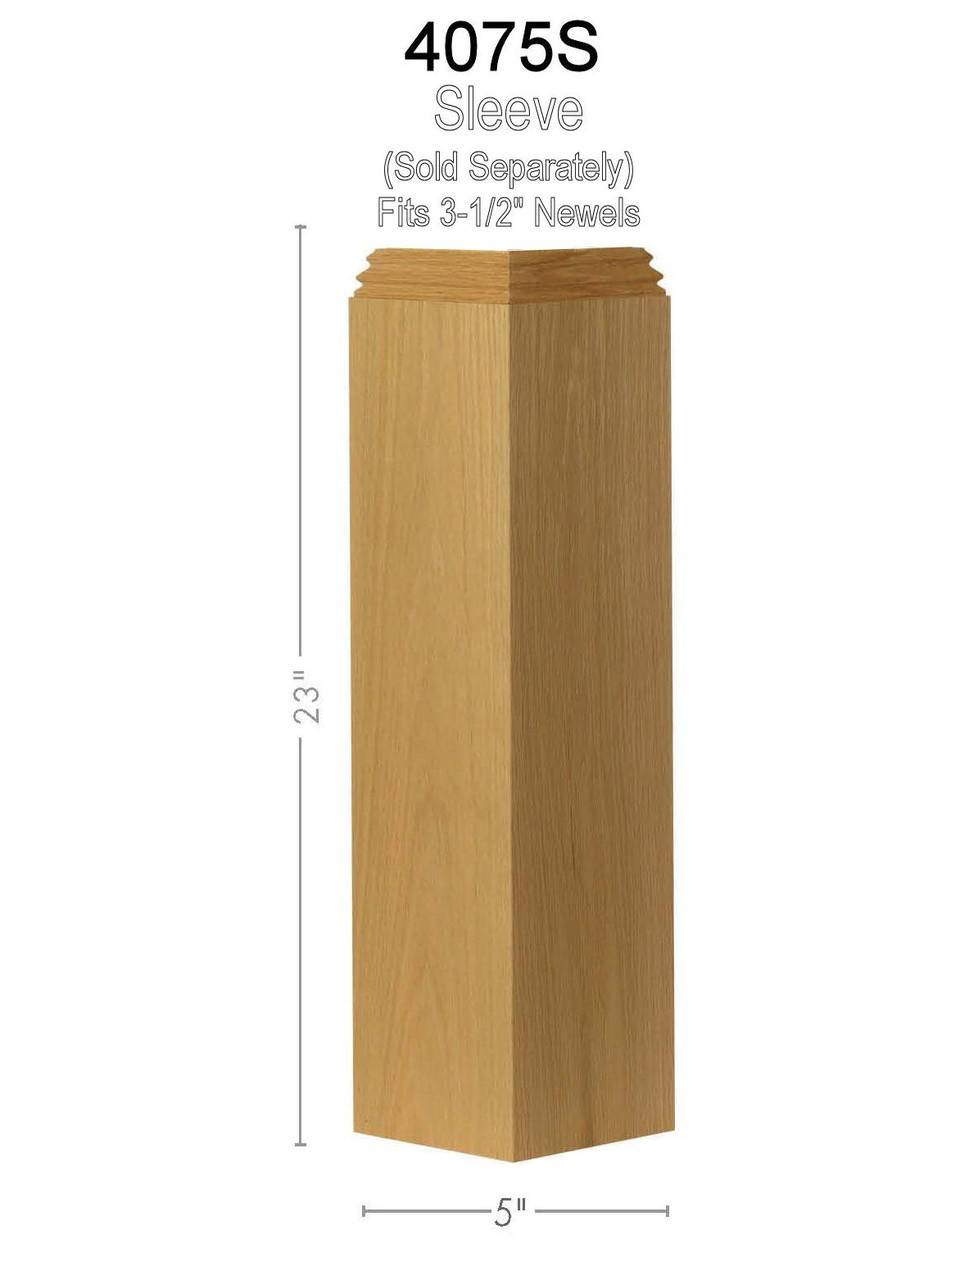 4075 Box Newel Pedestal/Sleeve Dimensional Information